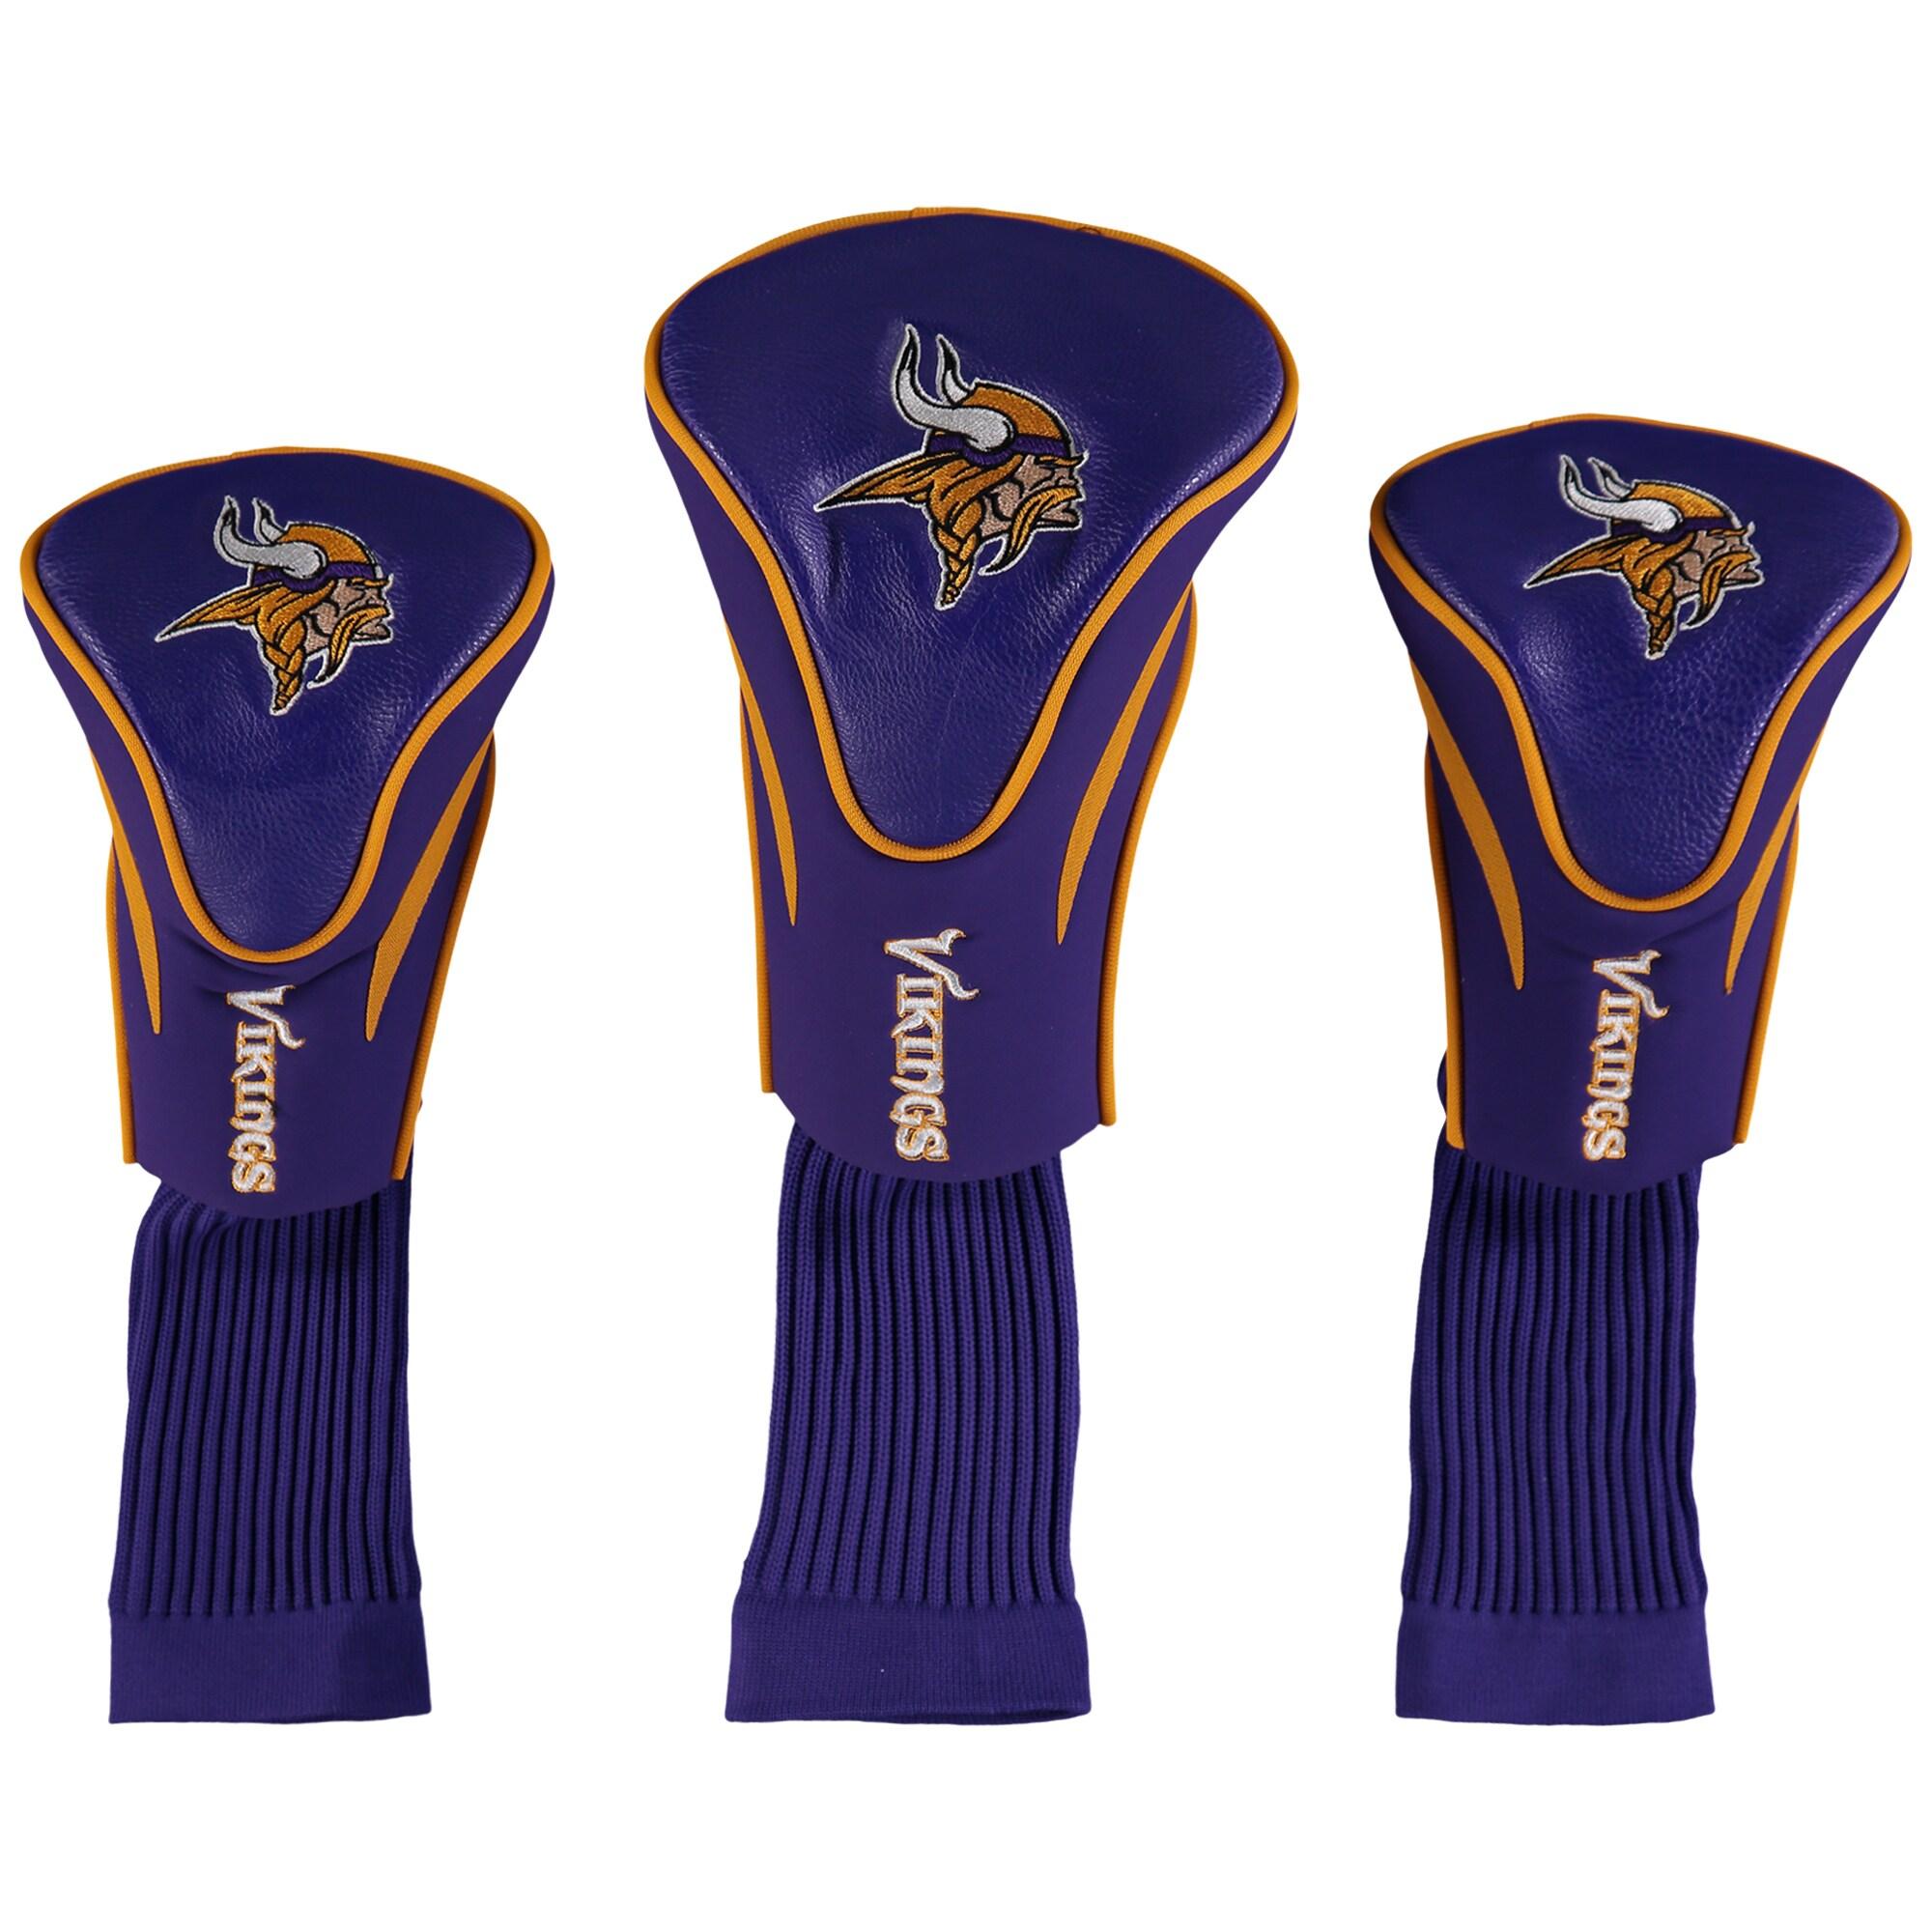 Minnesota Vikings 3-Pack Contour Golf Club Head Covers